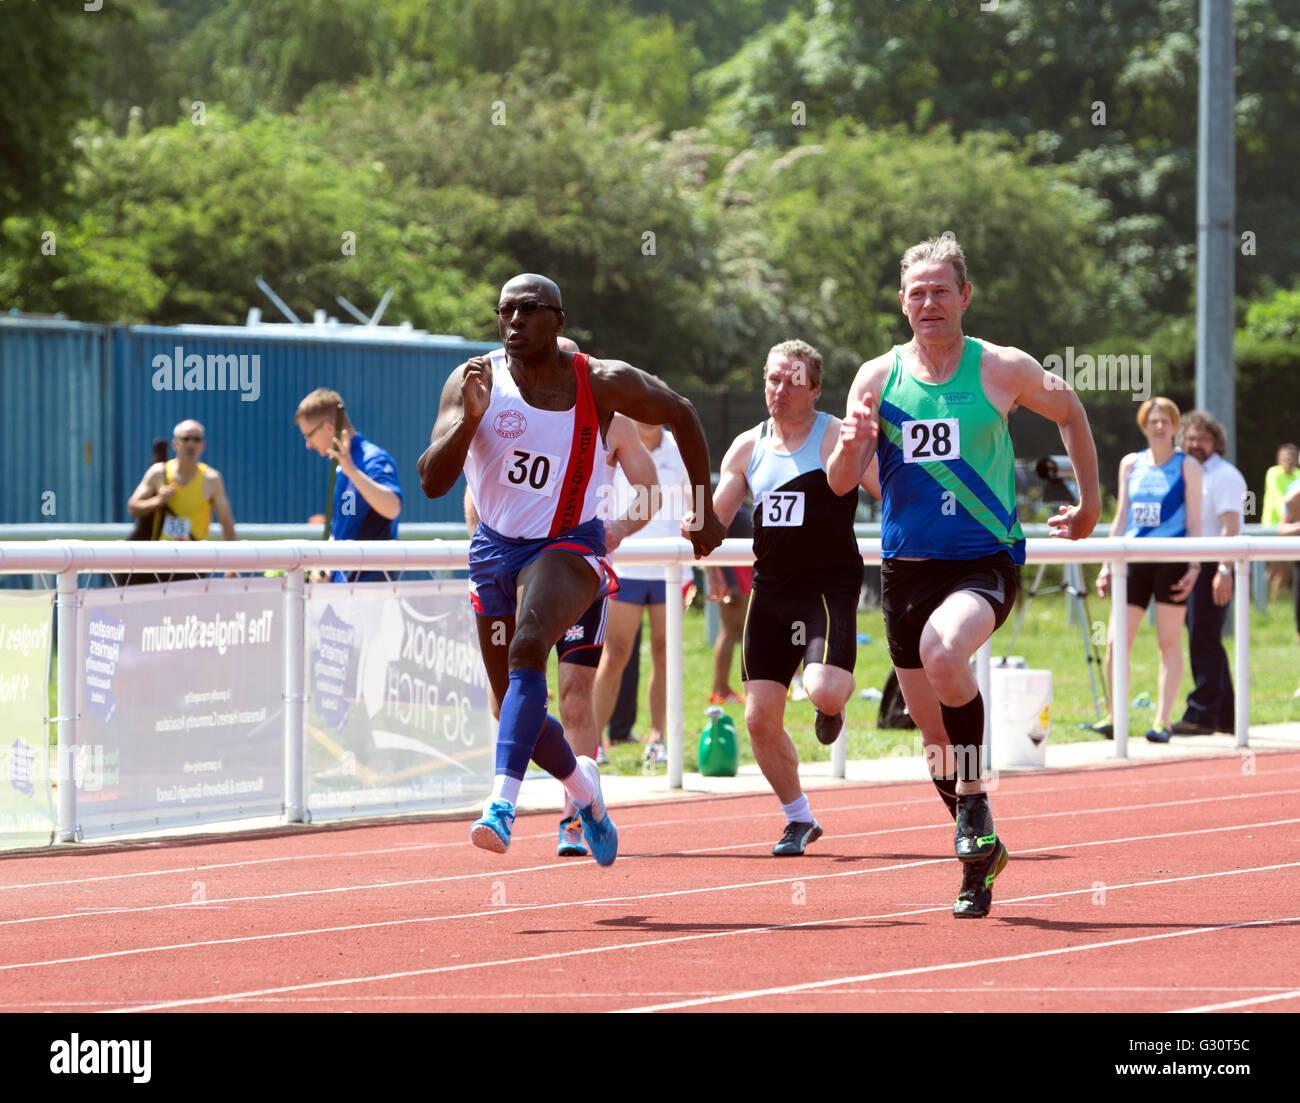 Masters athletics UK. Men`s 100m race. - Stock Image